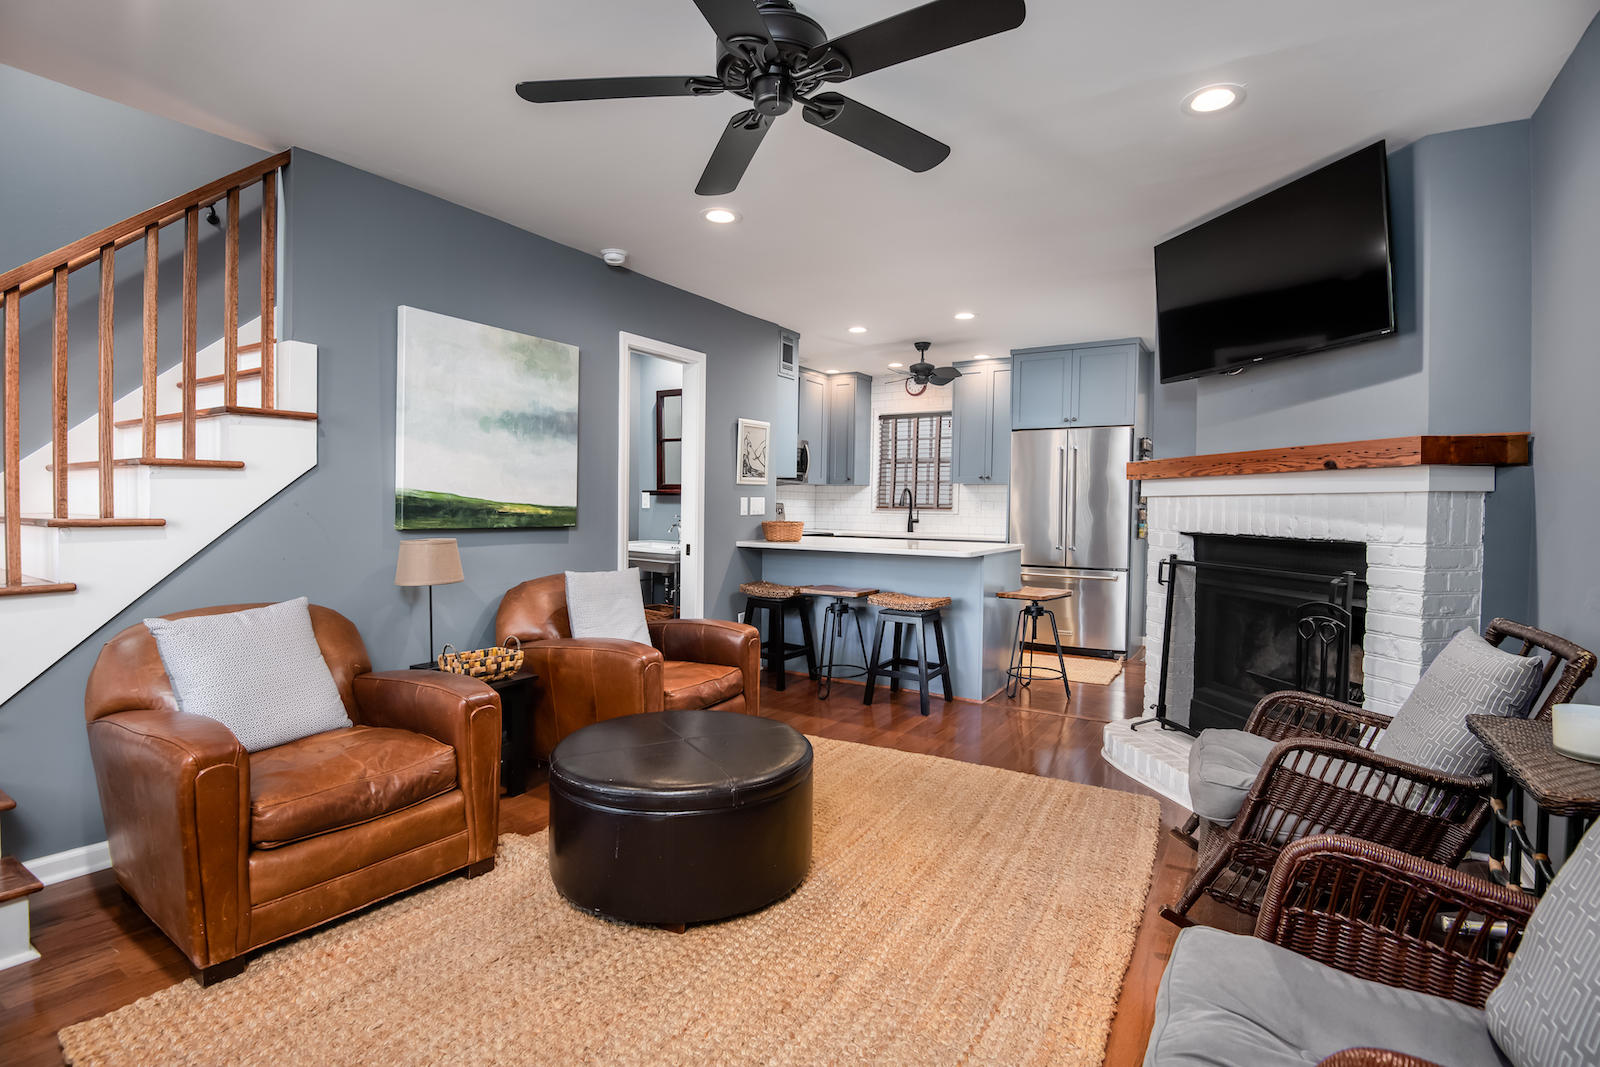 Harleston Village Homes For Sale - 15 Horlbeck, Charleston, SC - 8